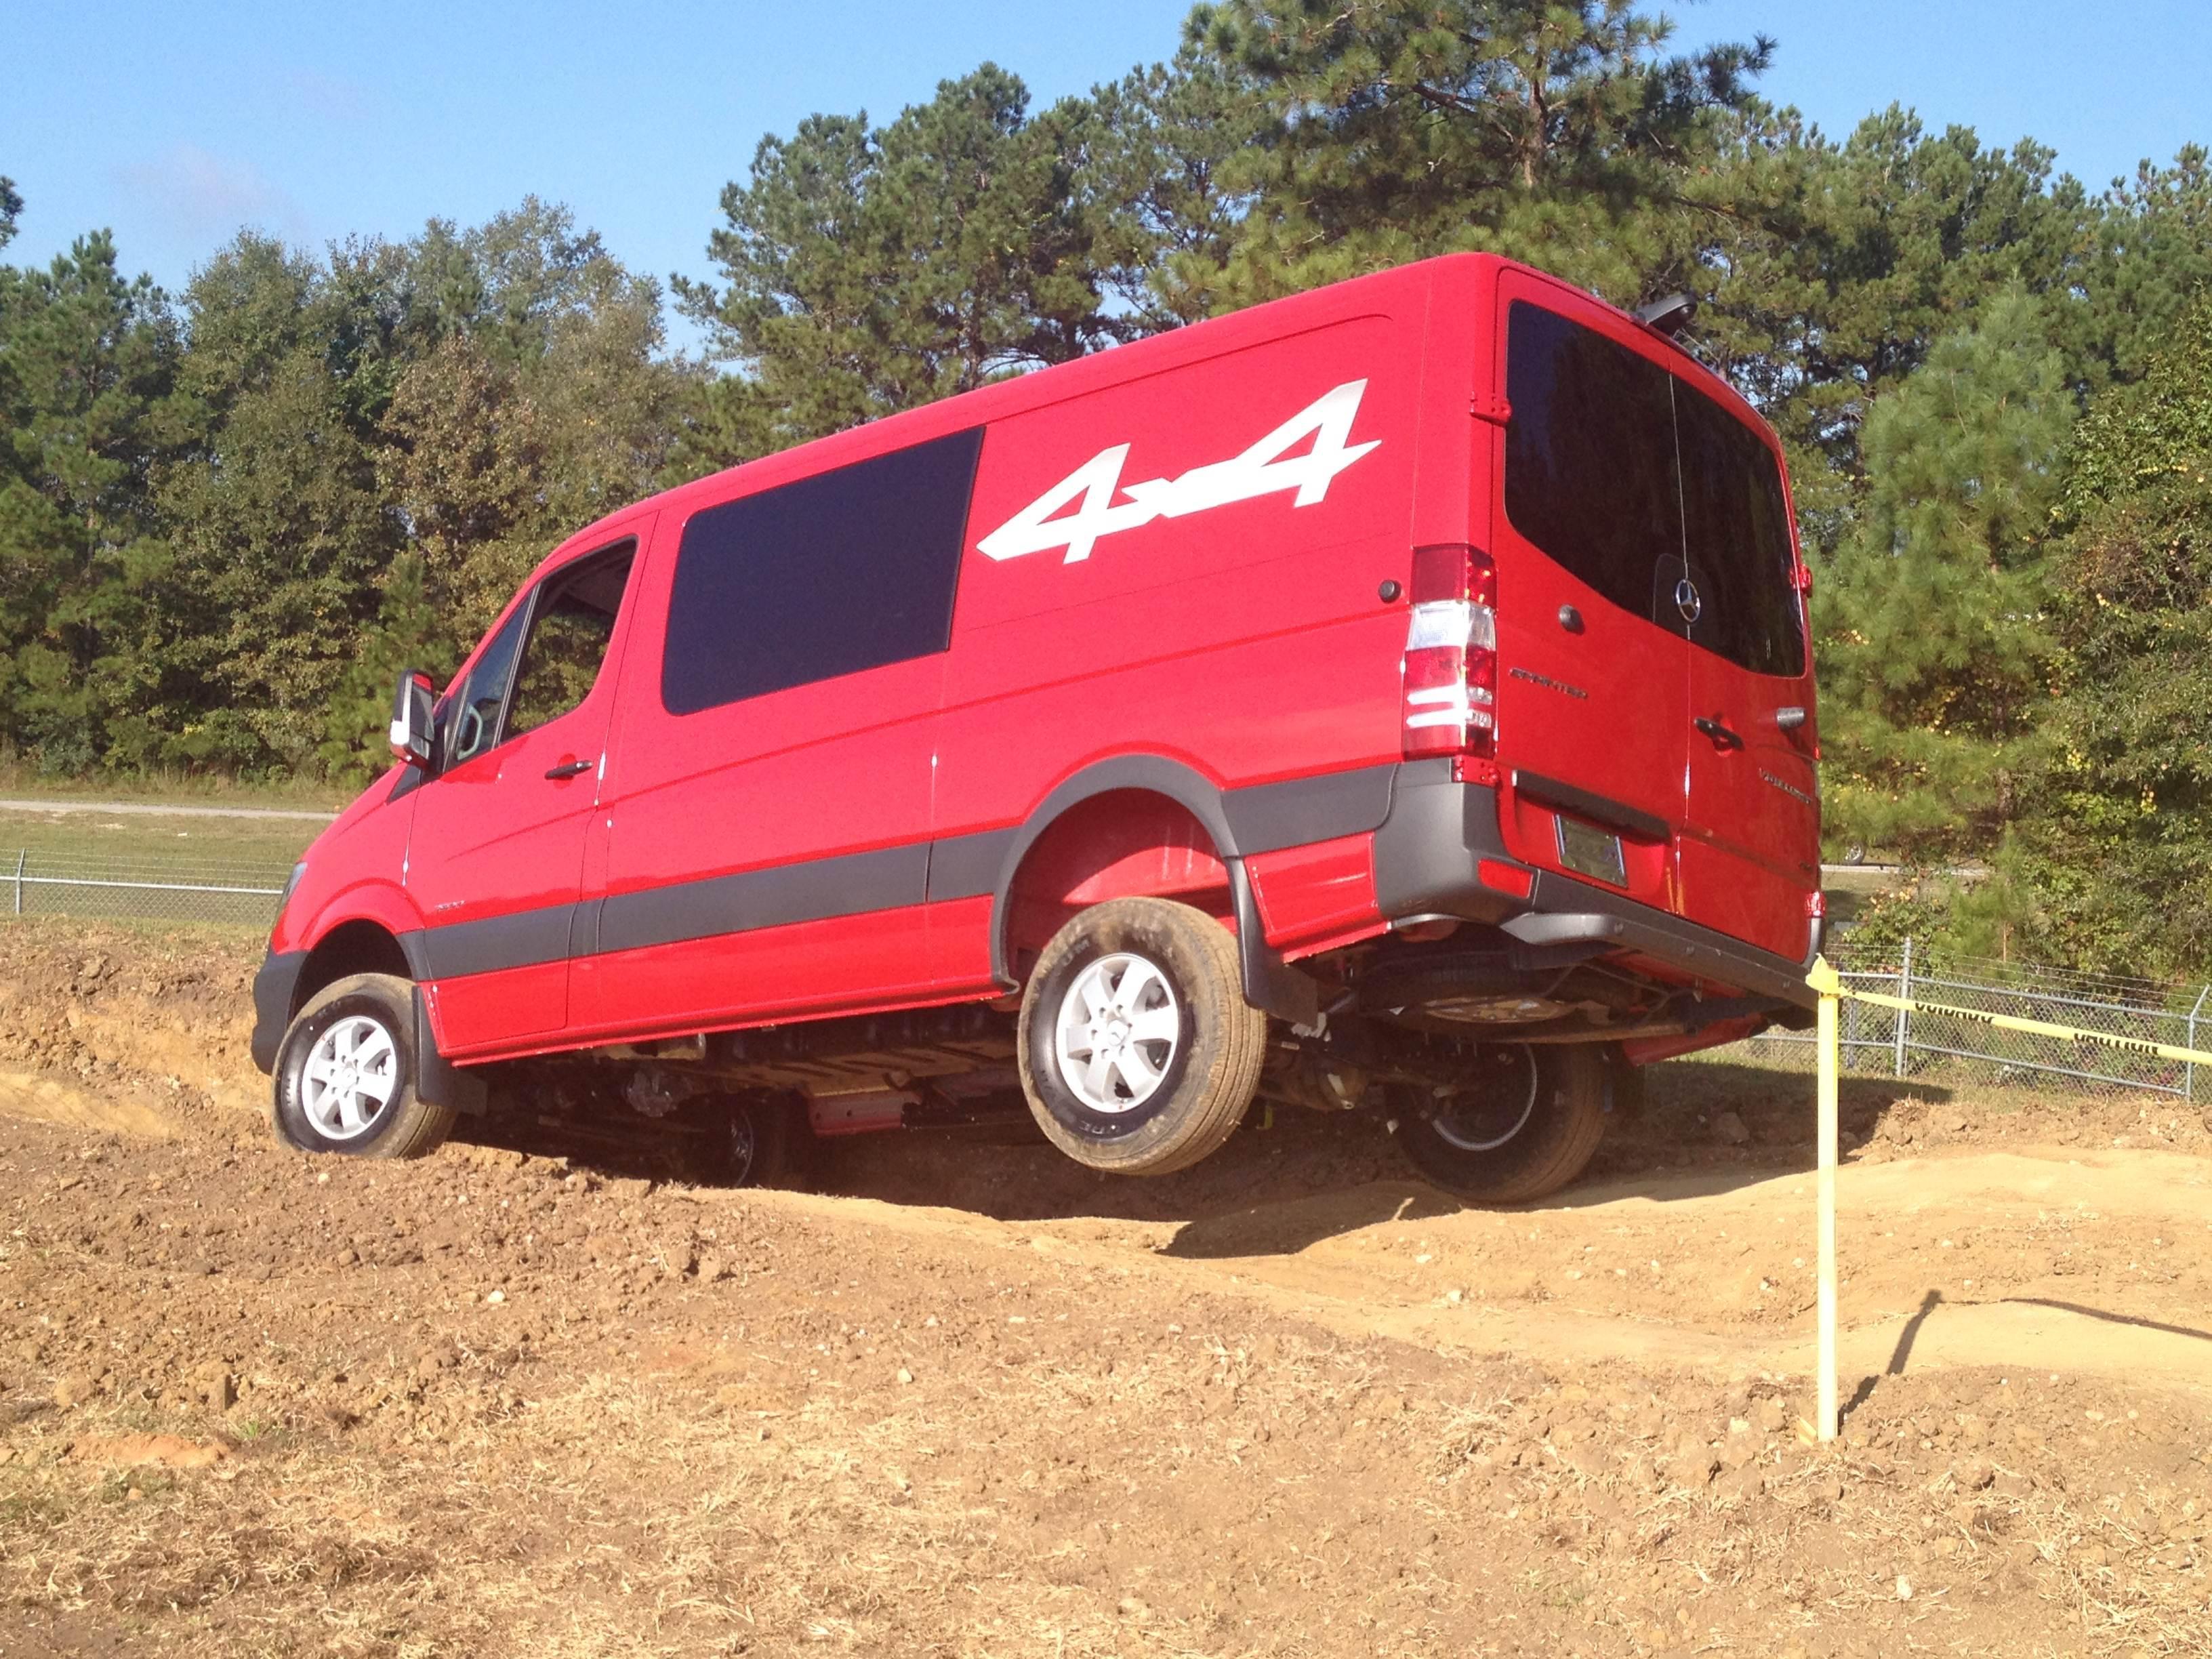 CCJ test drive: 2015 Sprinter 4x4